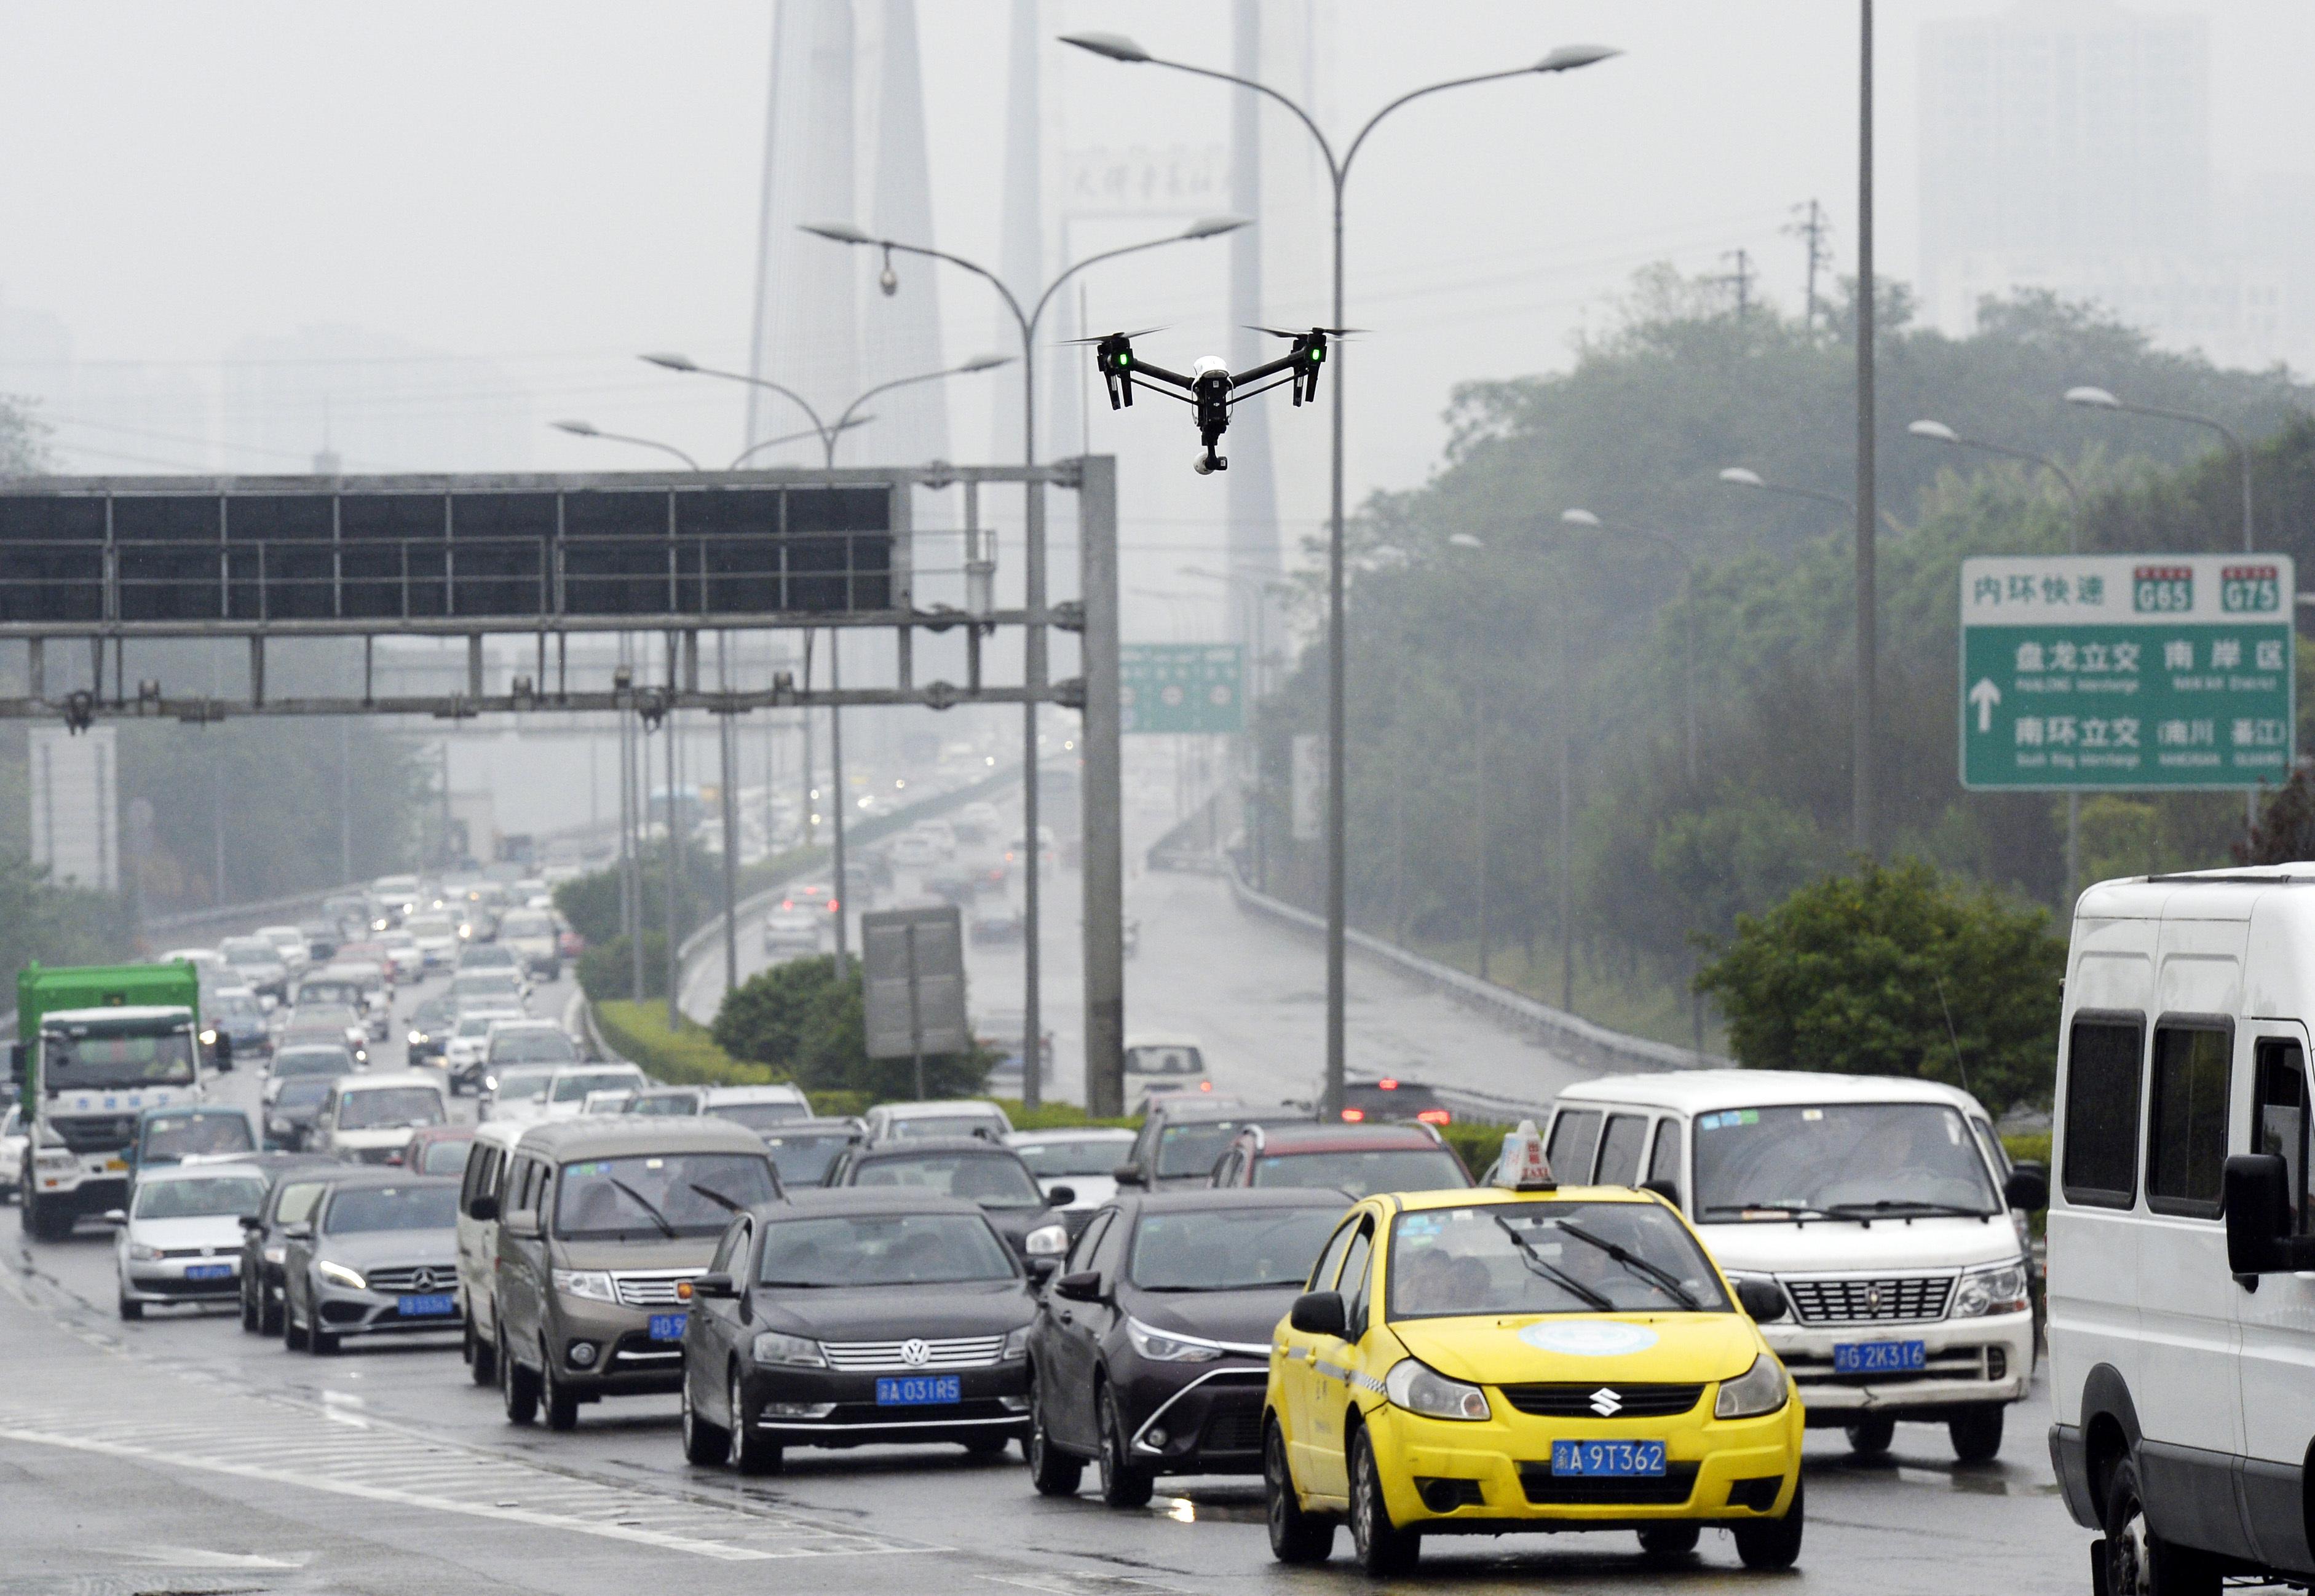 Drones To Help Traffic Police Probing Irregularities In Chongqing